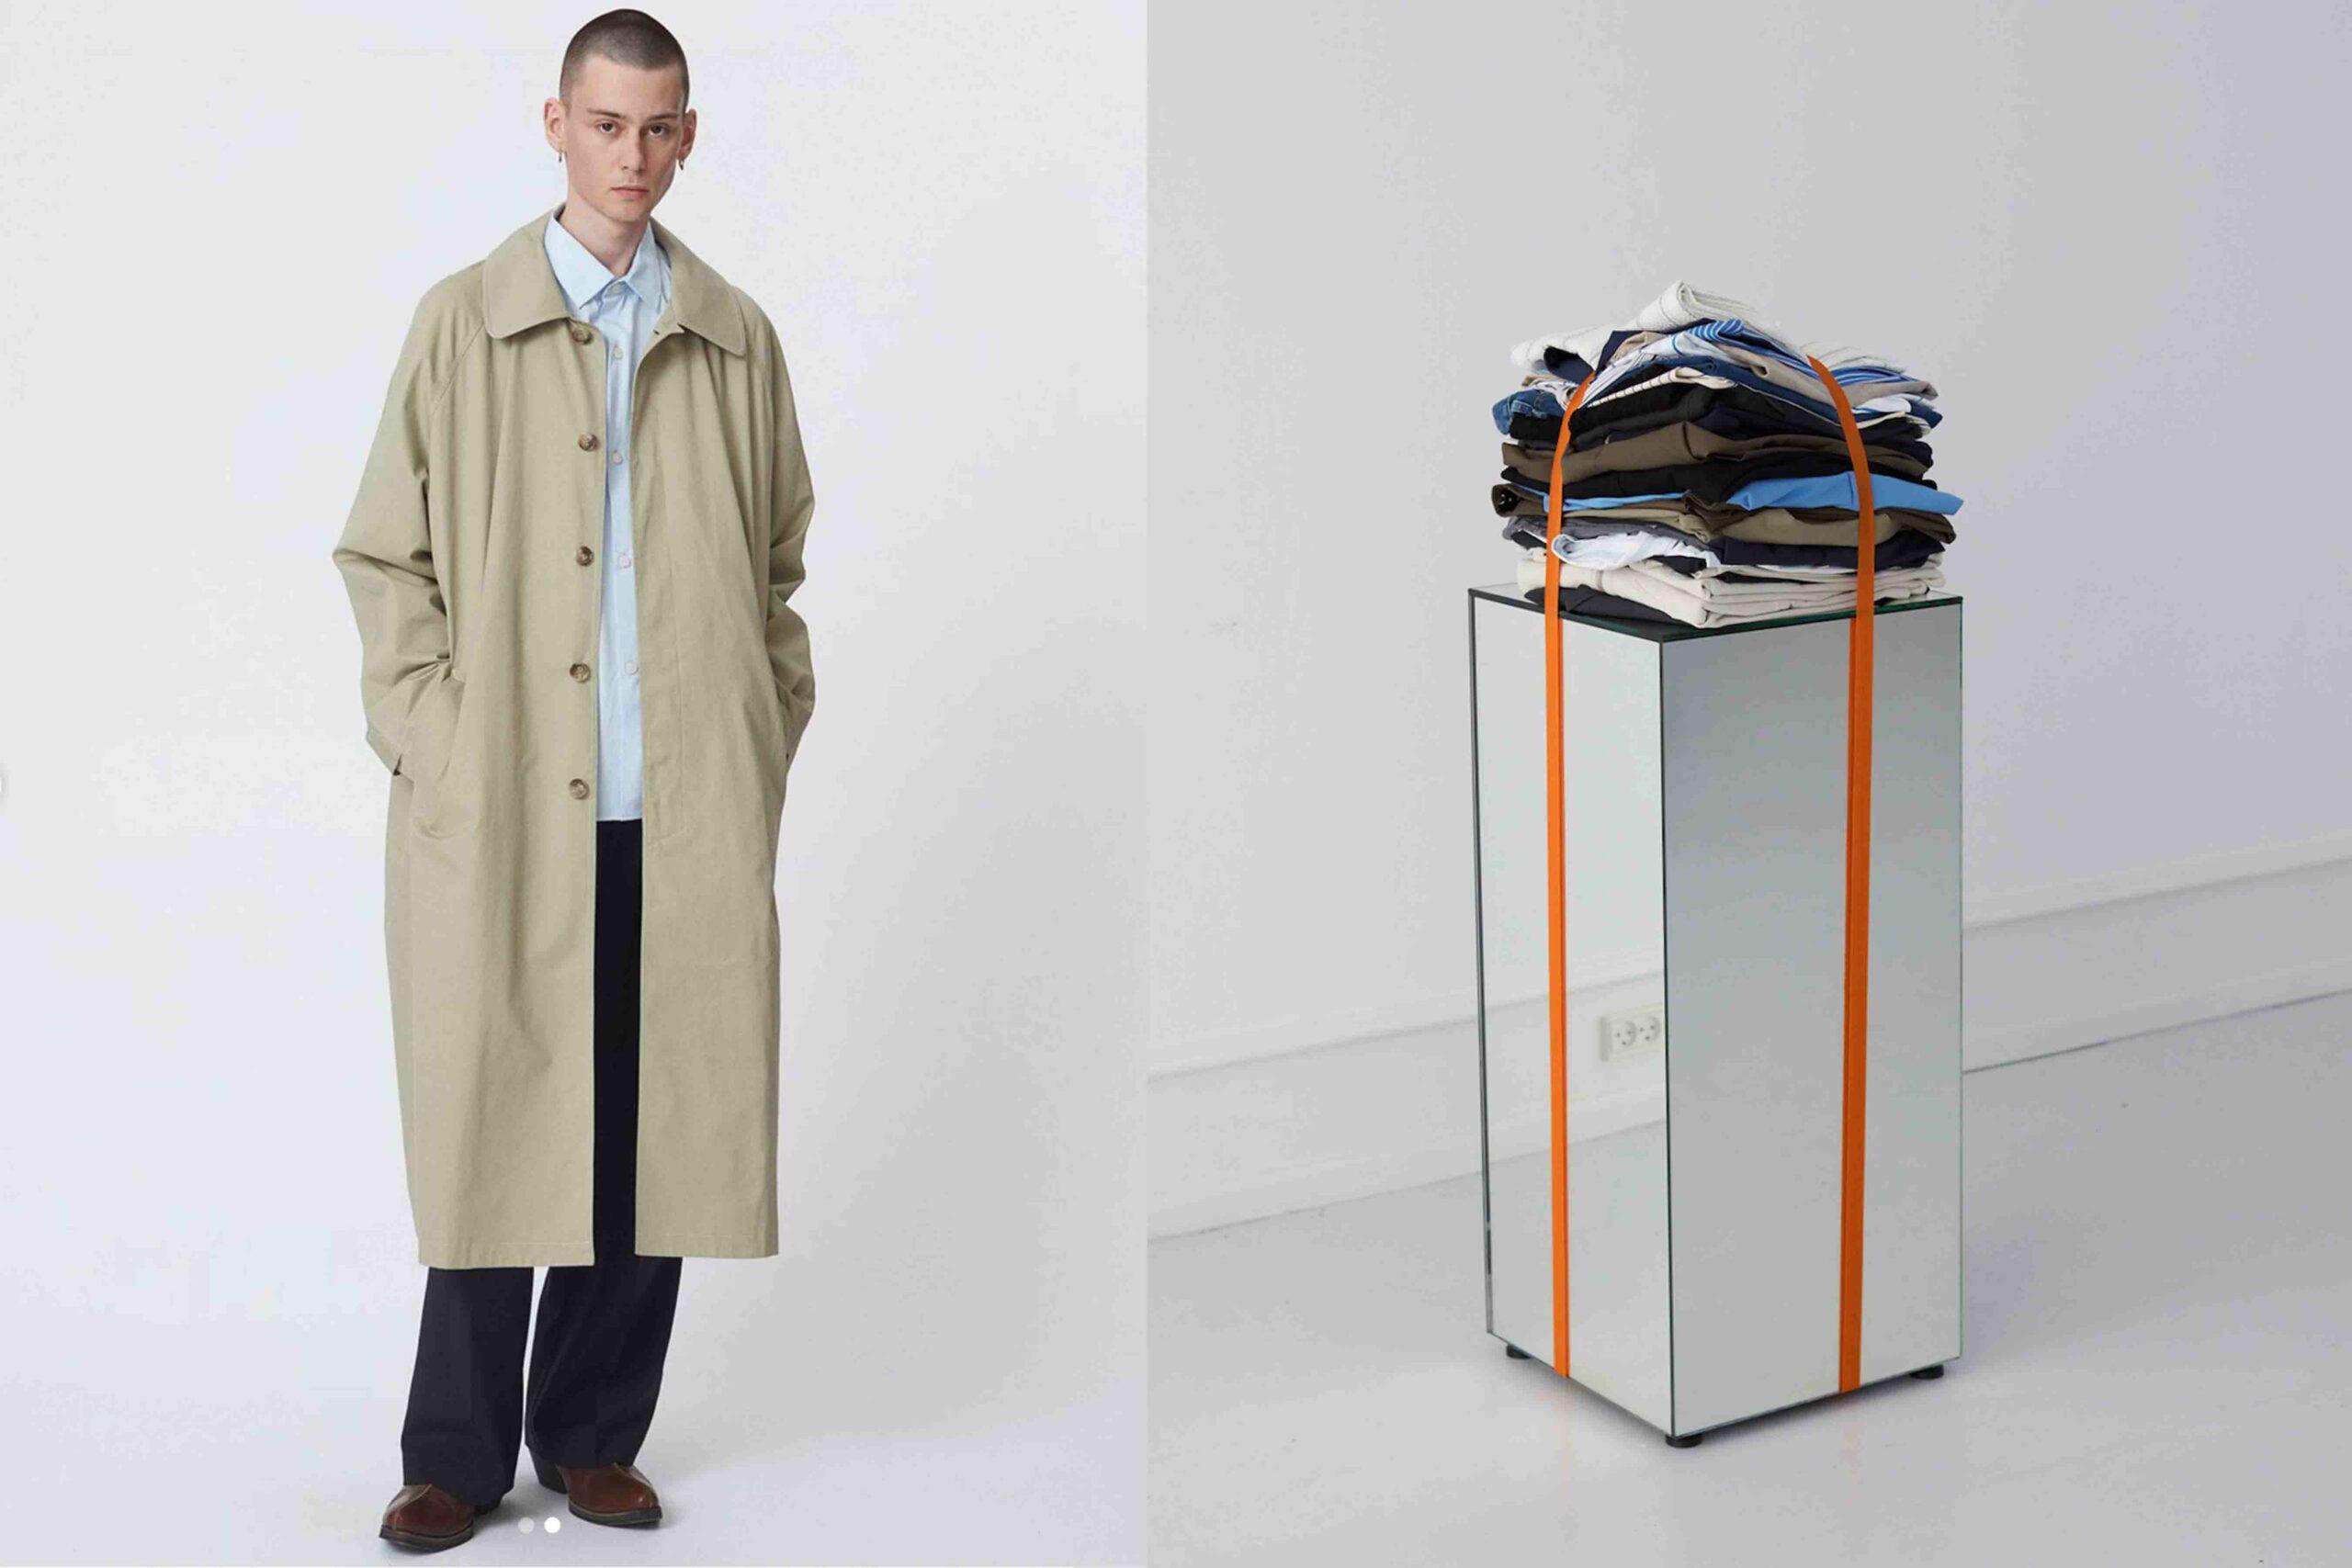 Rising Fashion Brands 2021: Mfpen